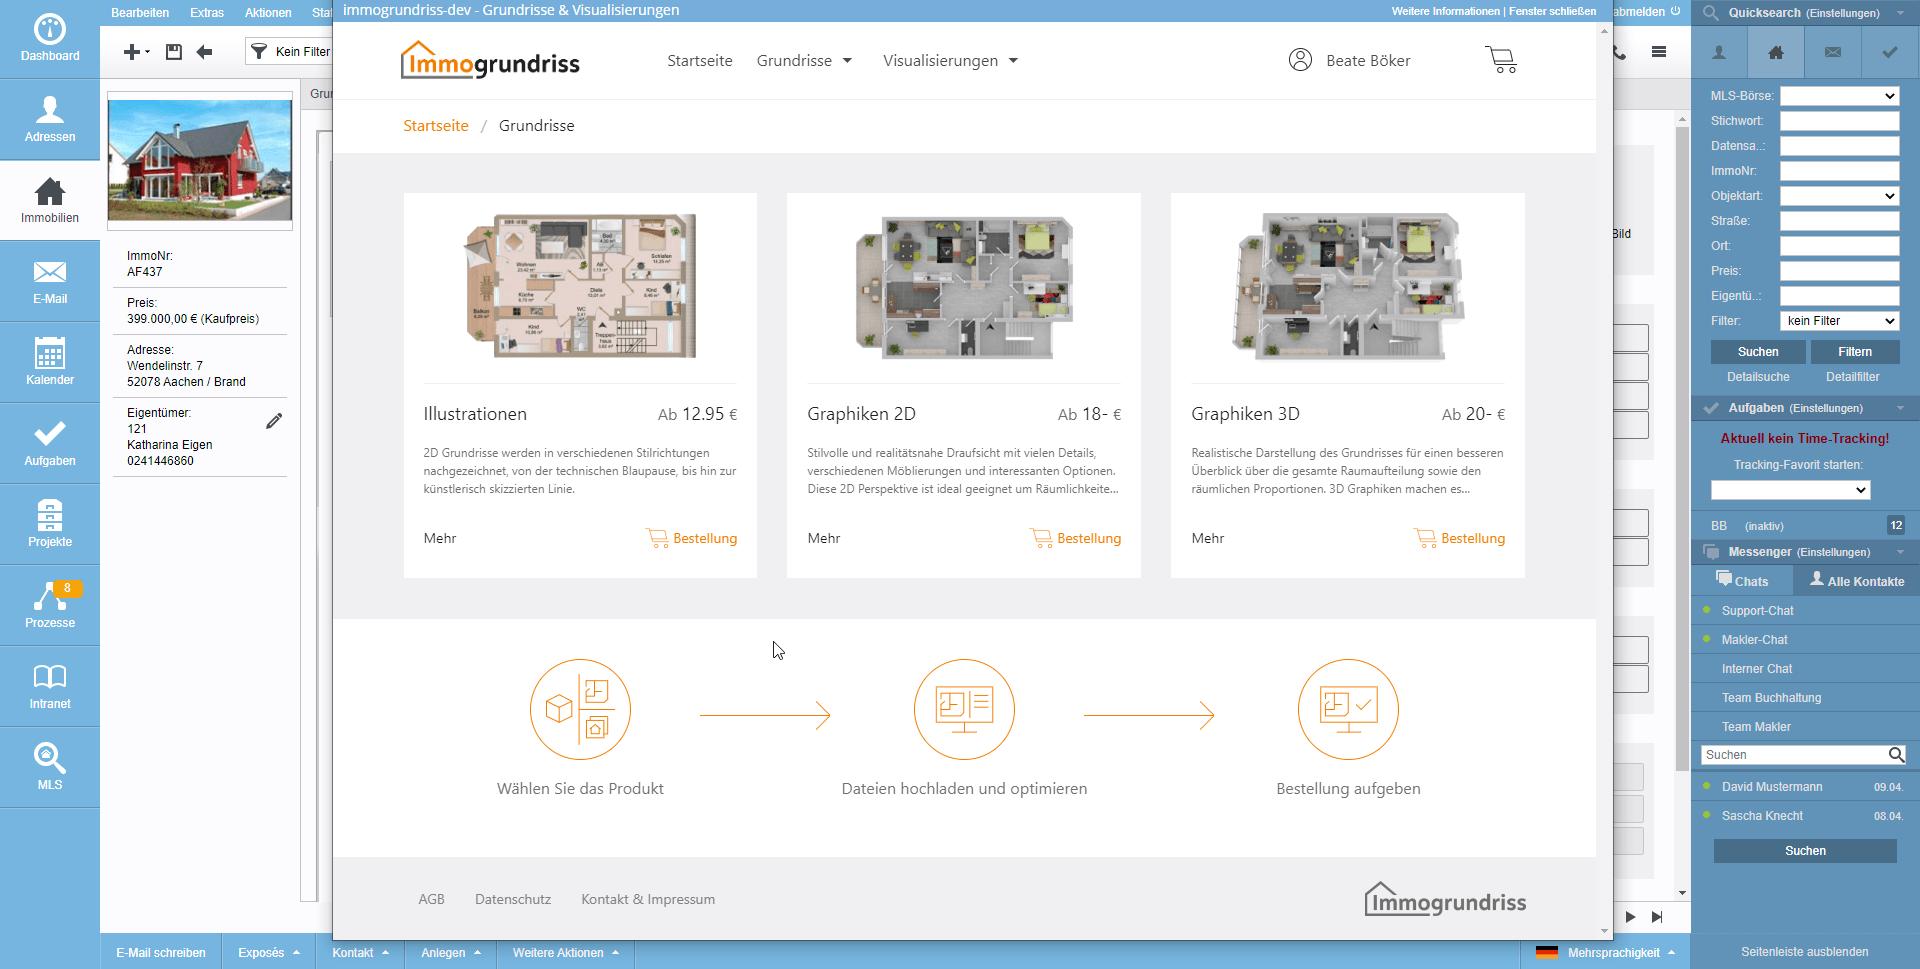 Screenshot onOffice Marketplace Immogrundriss